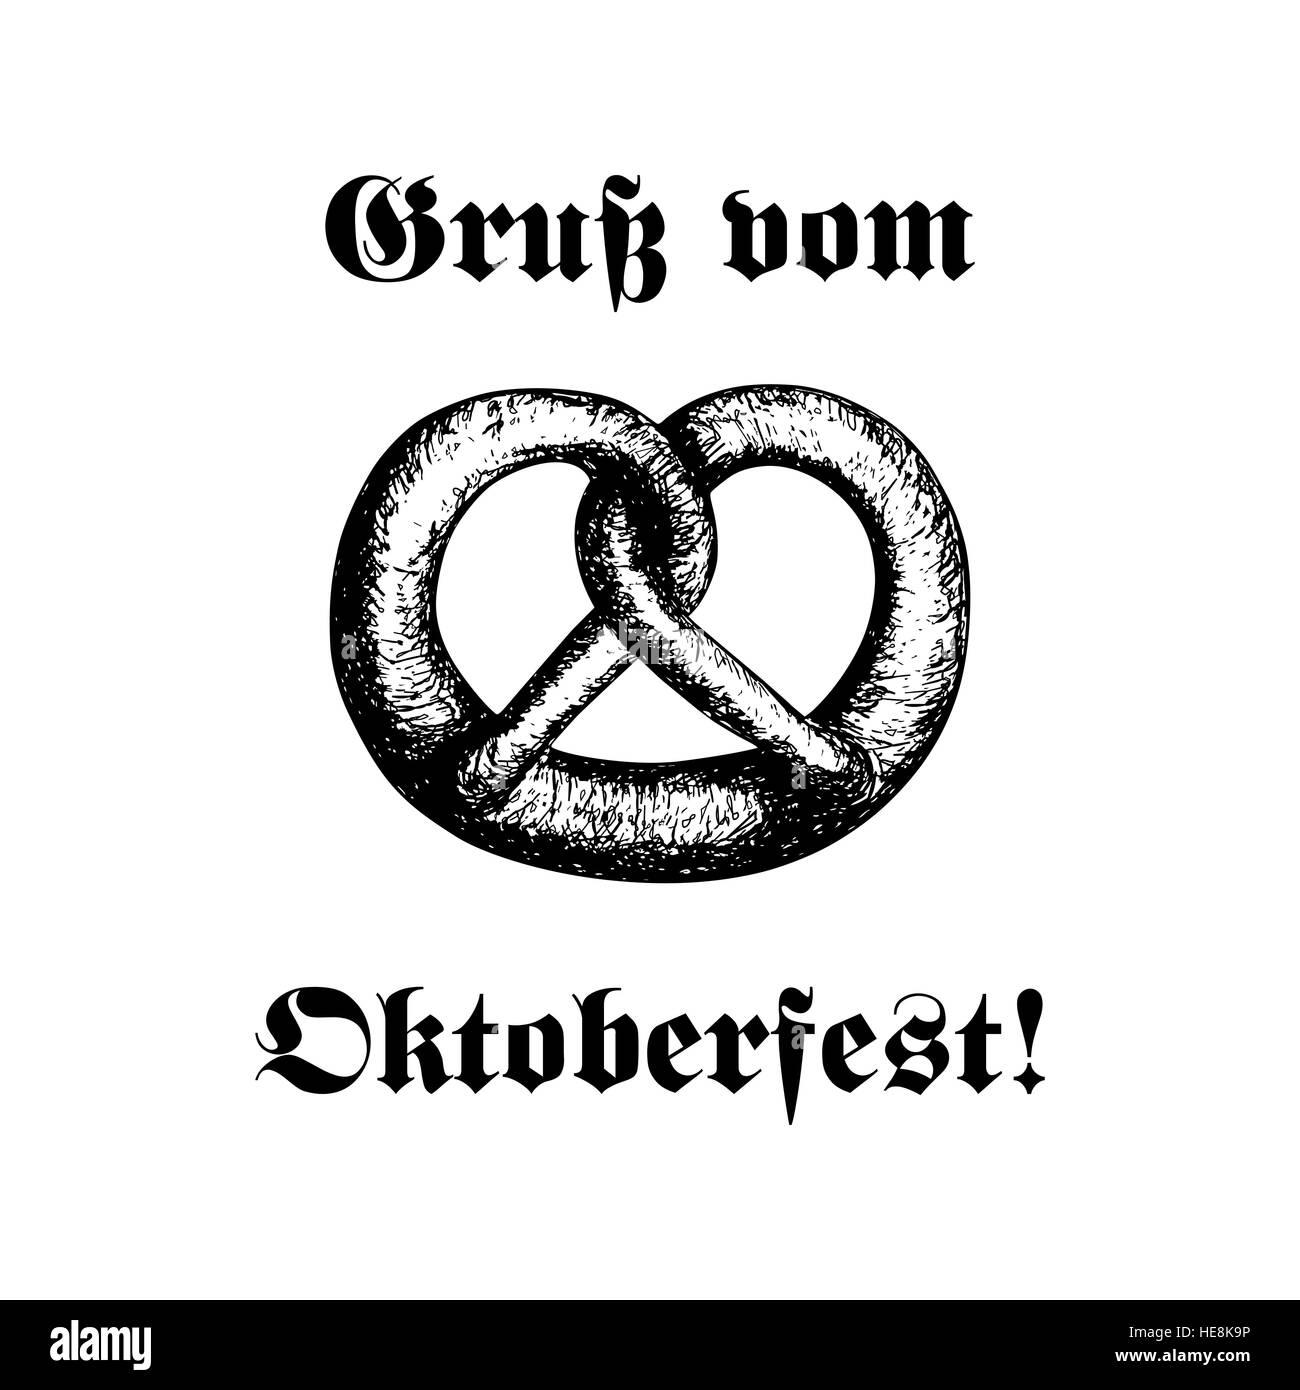 German pretzel black and white stock photos images alamy hand drawn vector illustration of a pretzel oktoberfest celebration design text in german m4hsunfo